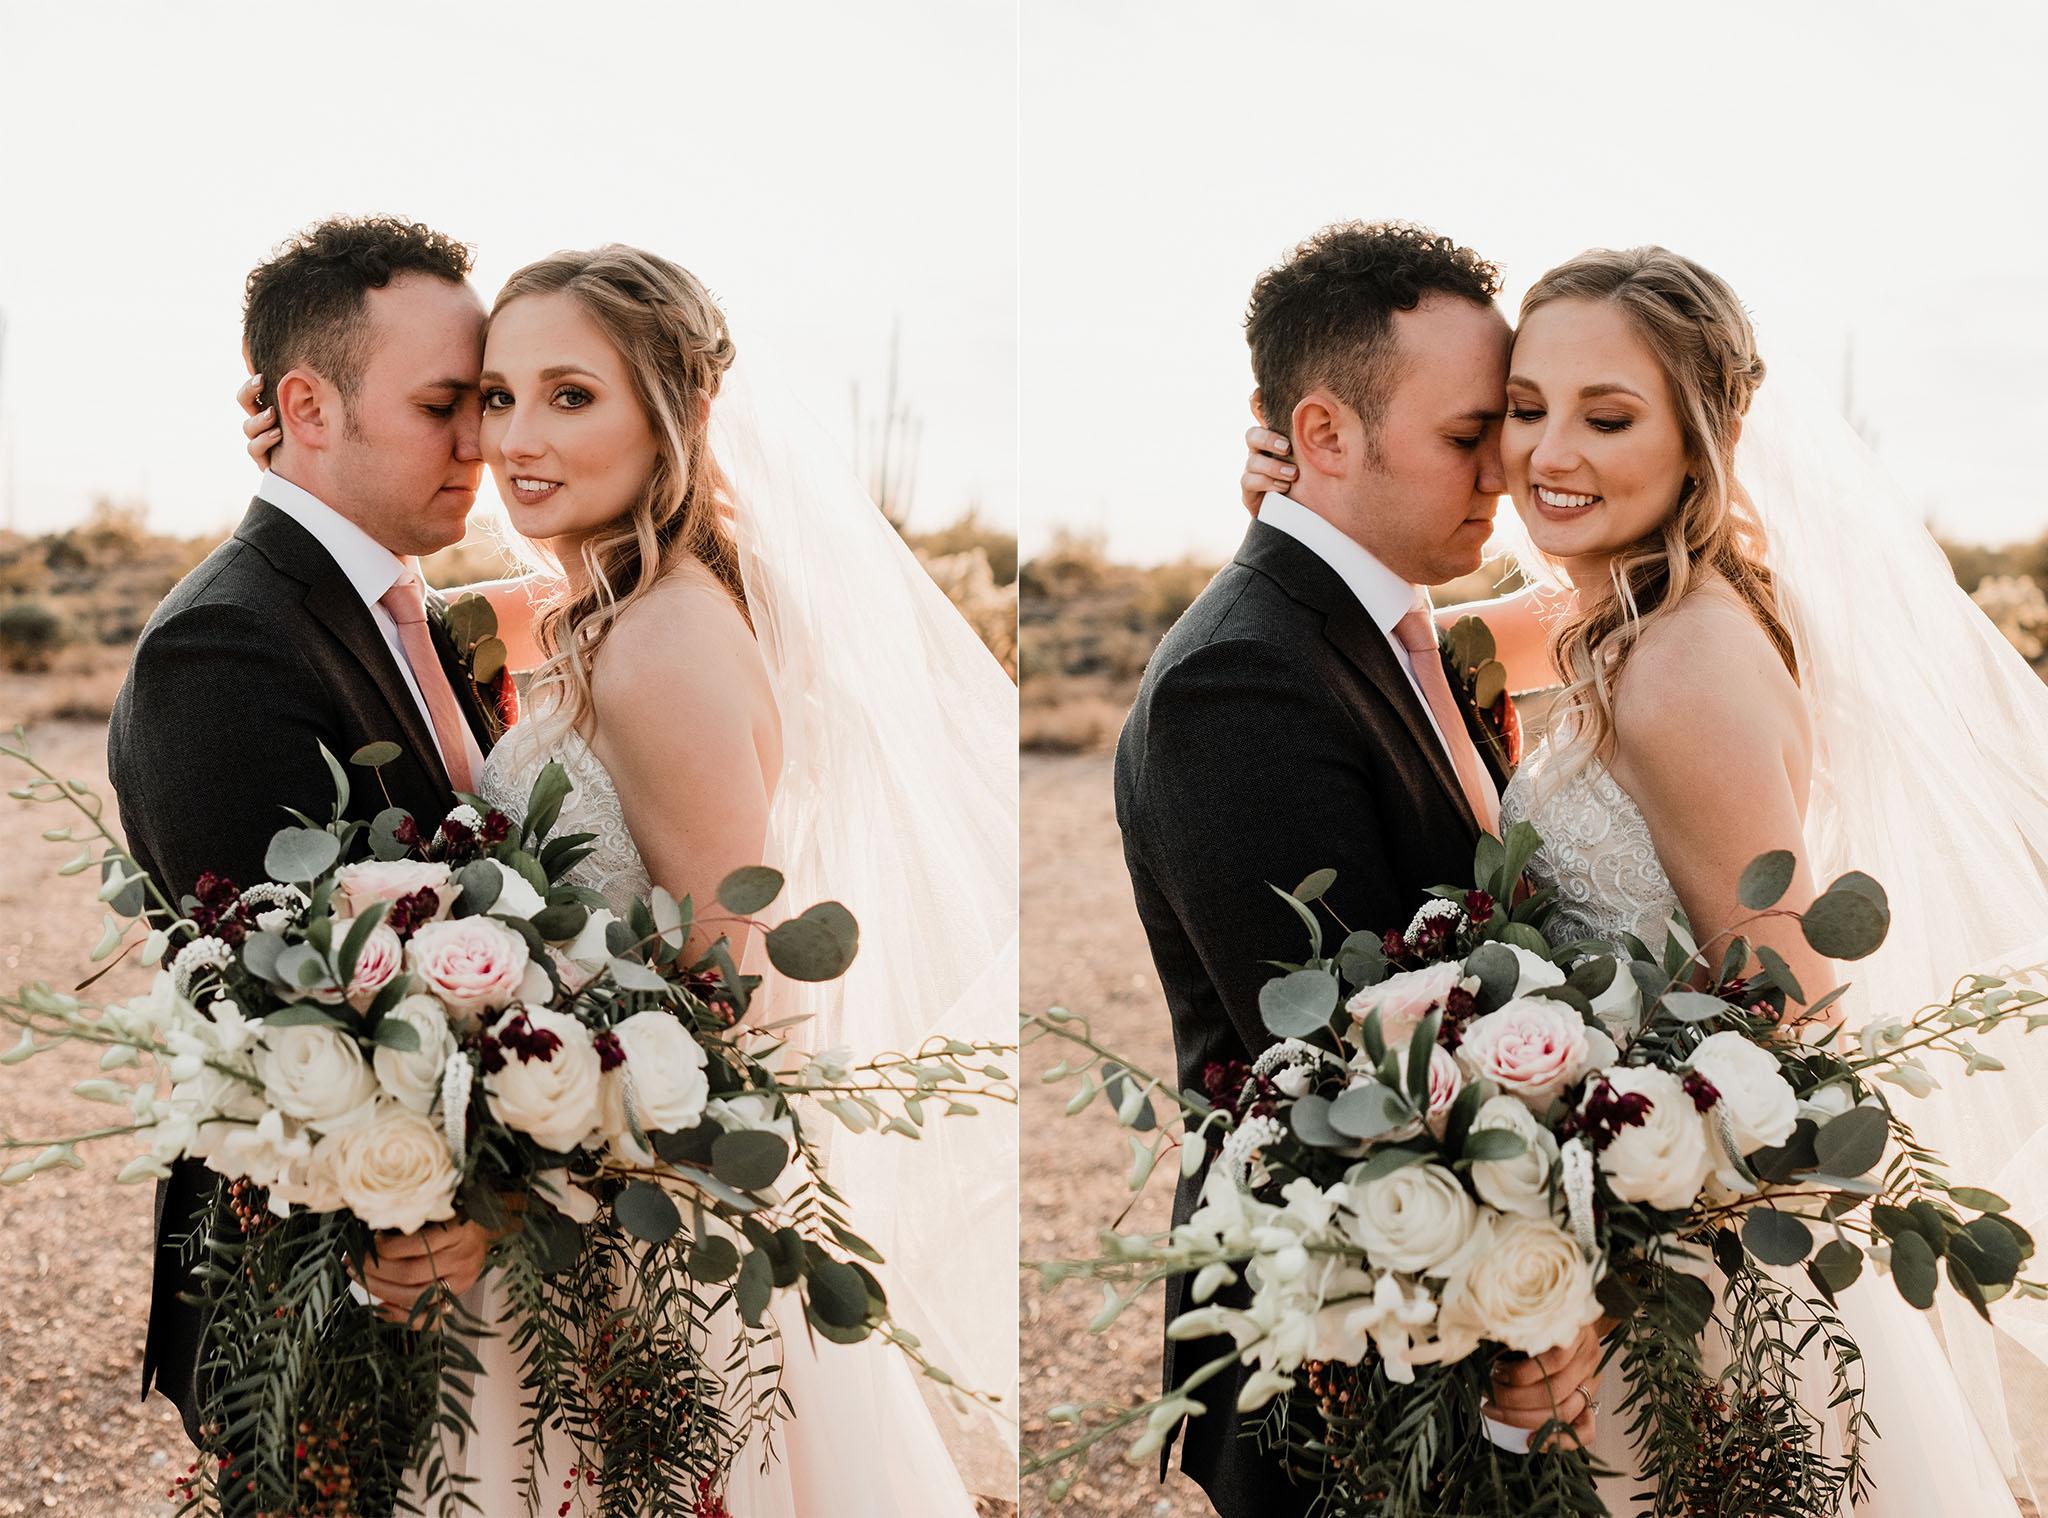 Arizona-Wedding-Photographer-The-Paseo-Venue29.jpg